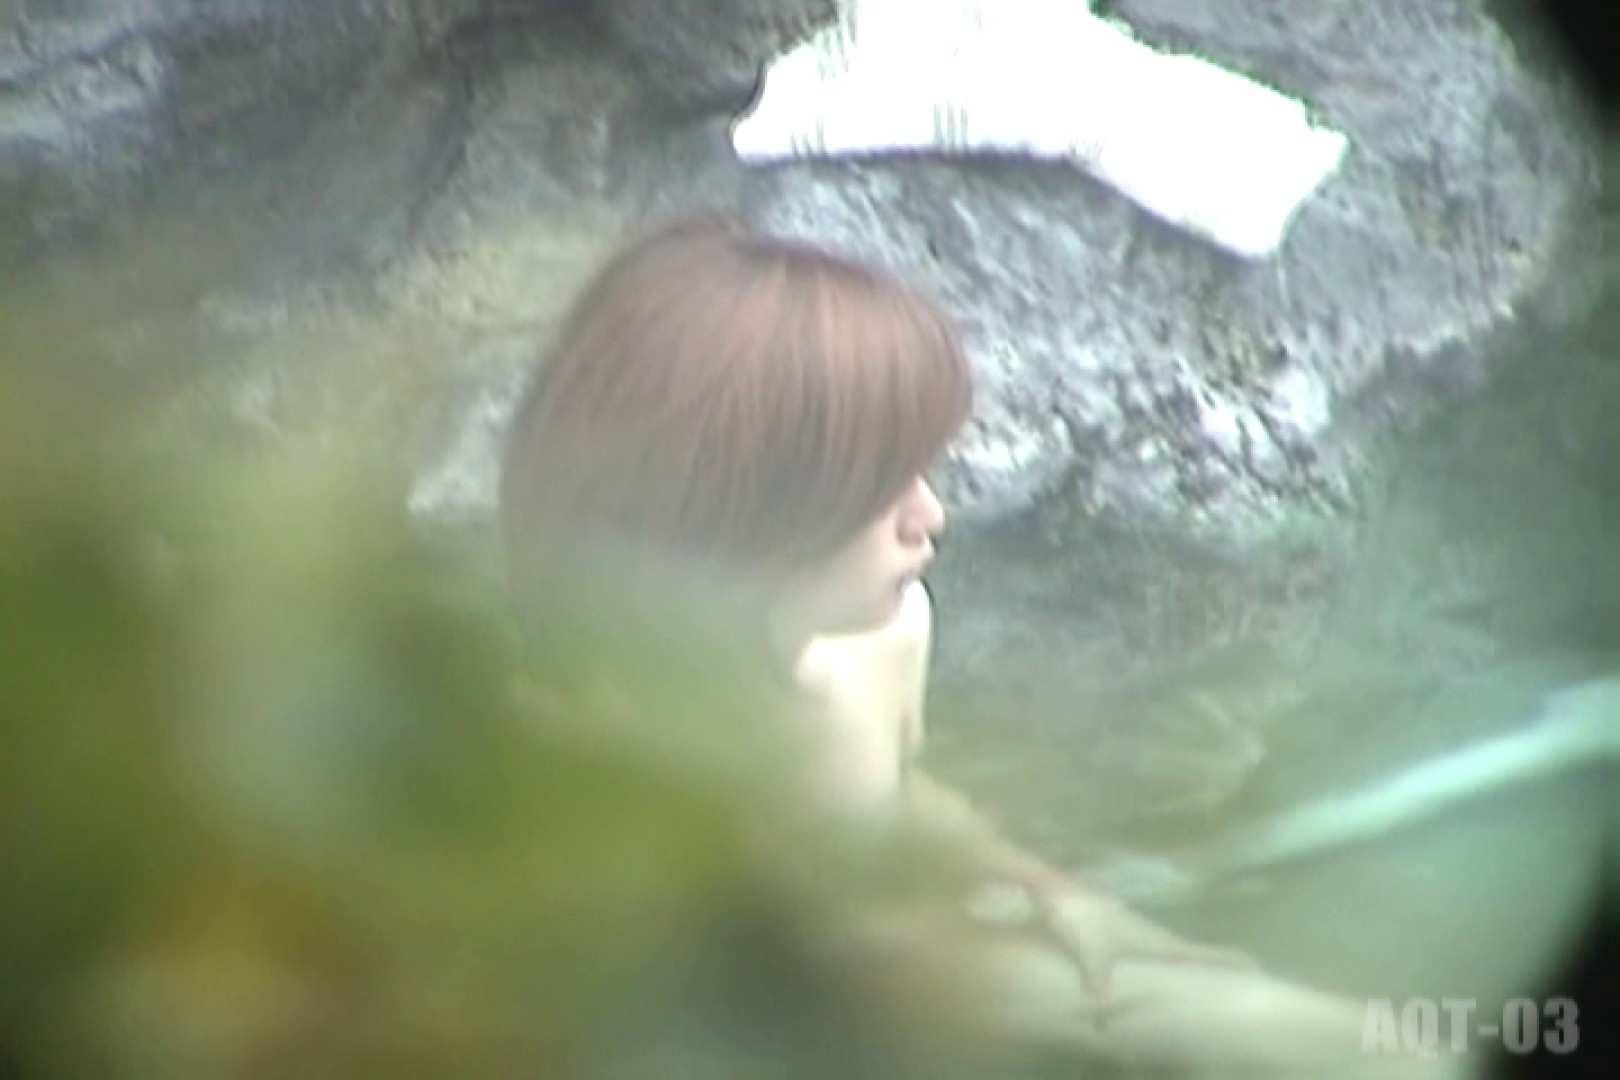 Aquaな露天風呂Vol.731 エロいOL オメコ動画キャプチャ 99枚